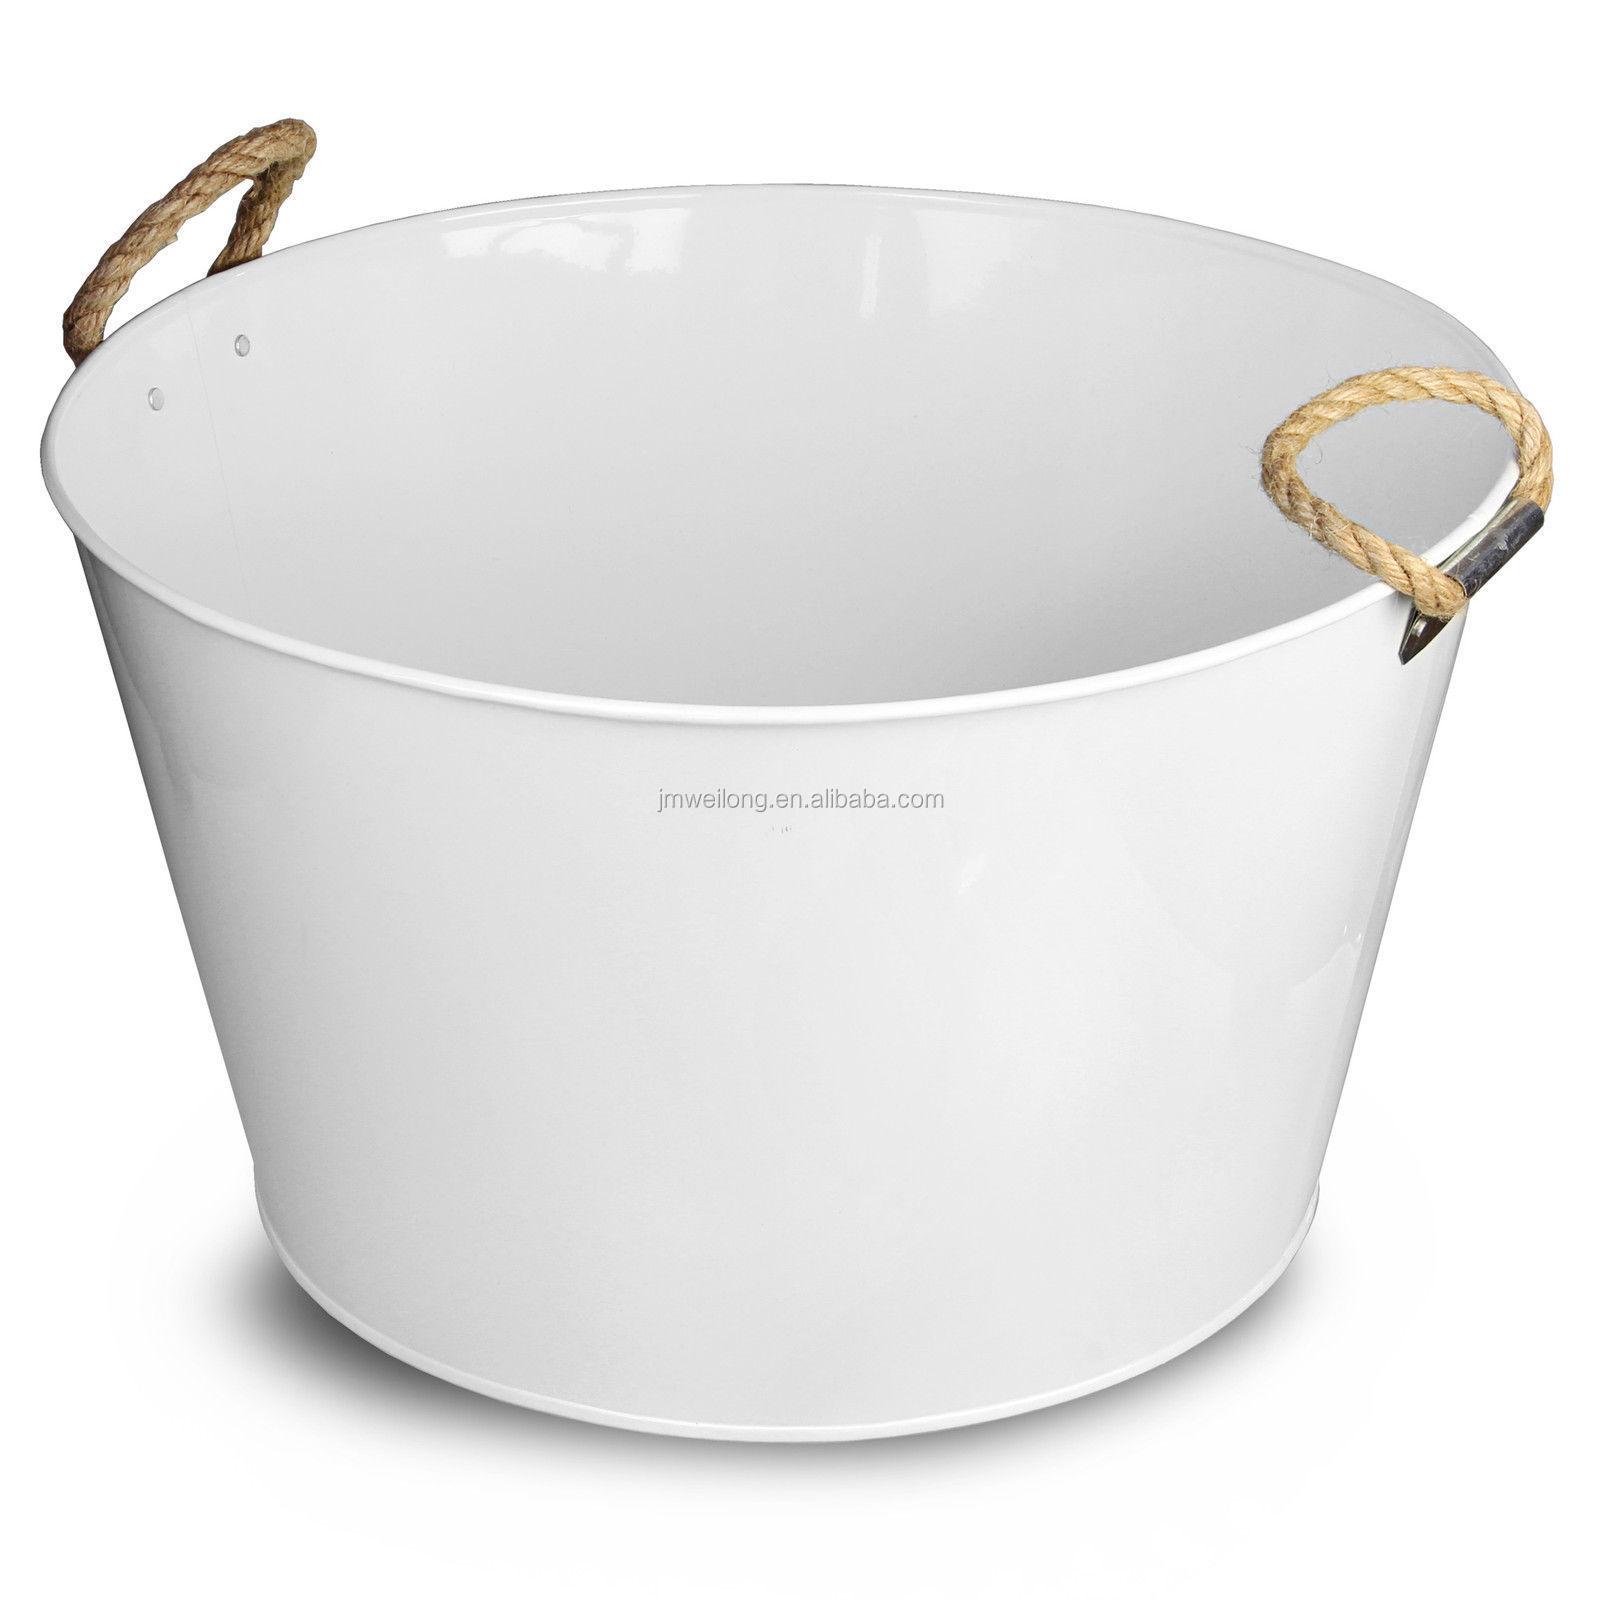 Party Bucket Tub With Rope Handle White Galvanised Steel Drinks Pail Cooler Beer Buy Metal Ice Bucket Beer Cooler Metal Beer Bucket Product On Alibaba Com